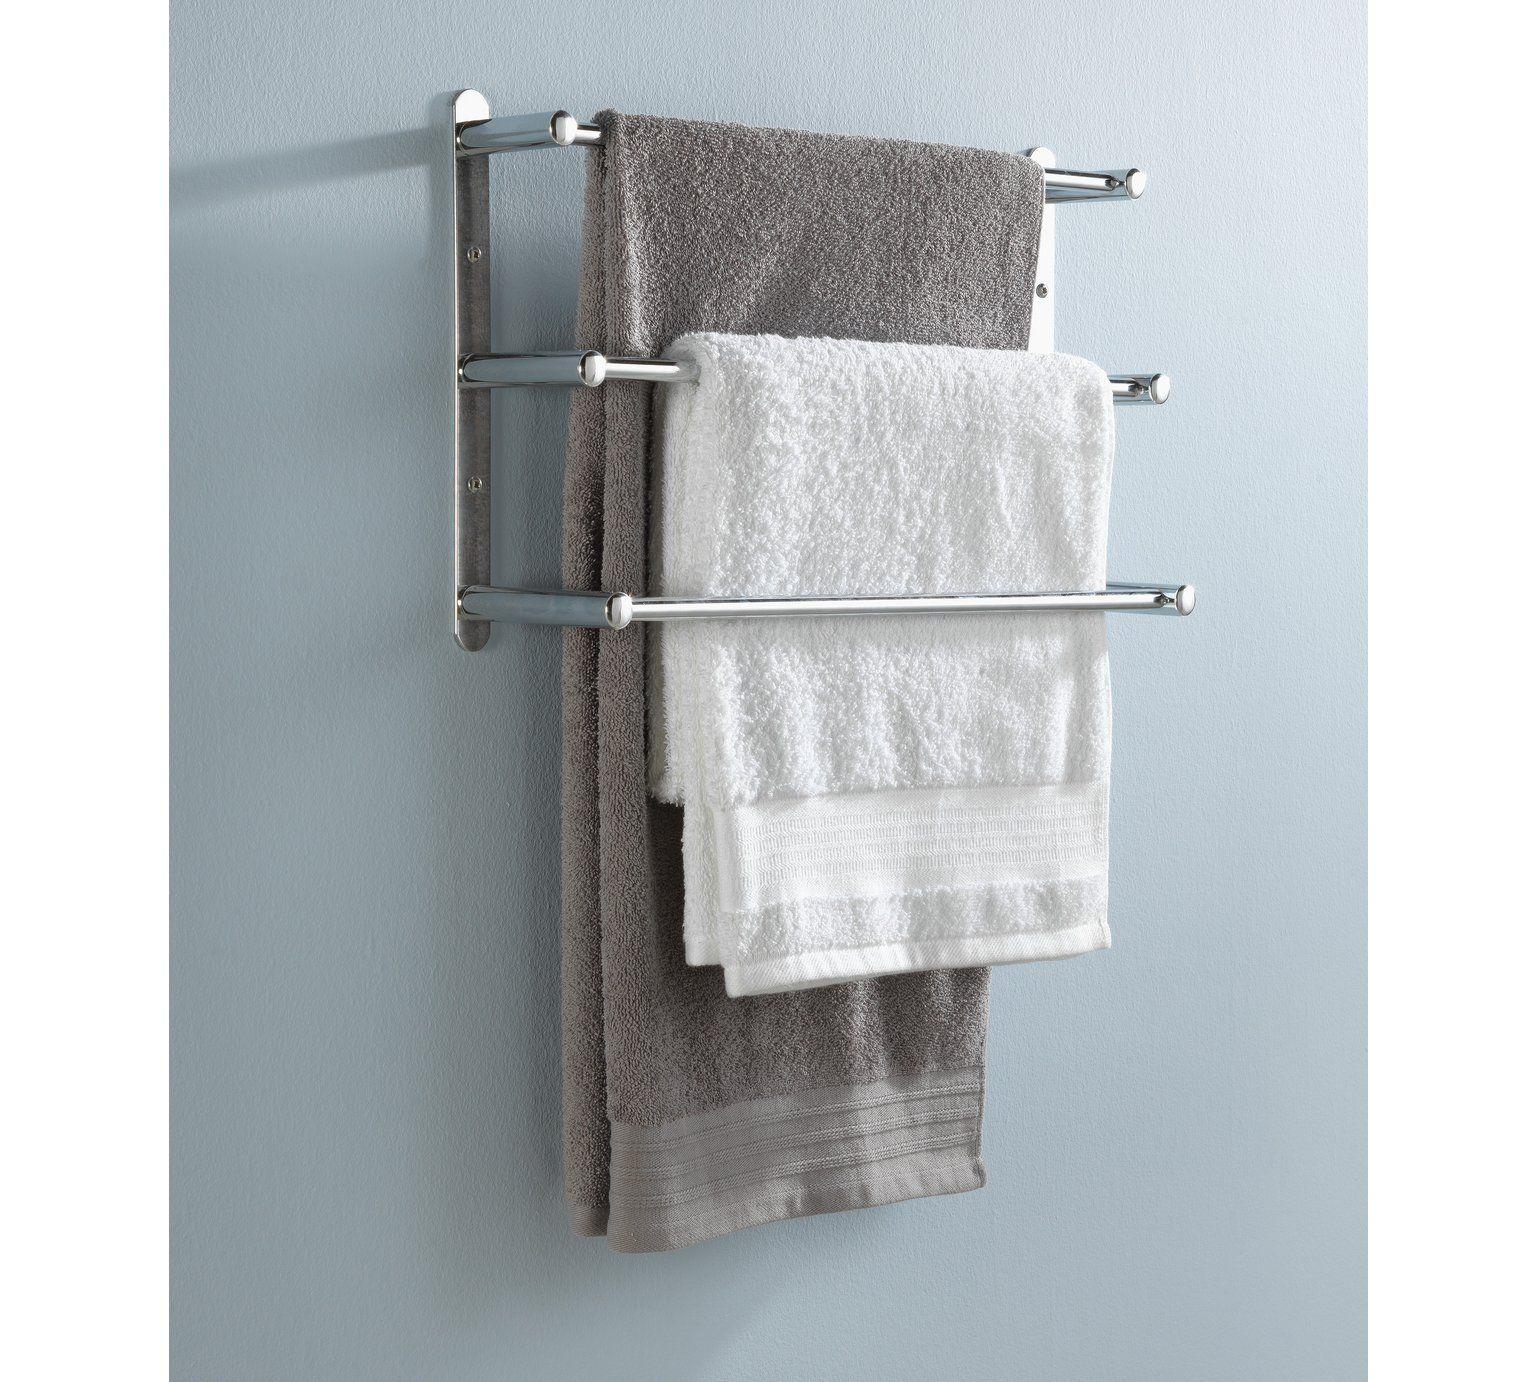 Buy HOME 3 Tier Wall Mounted Steel Towel Rack at Argos.co.uk, visit ...